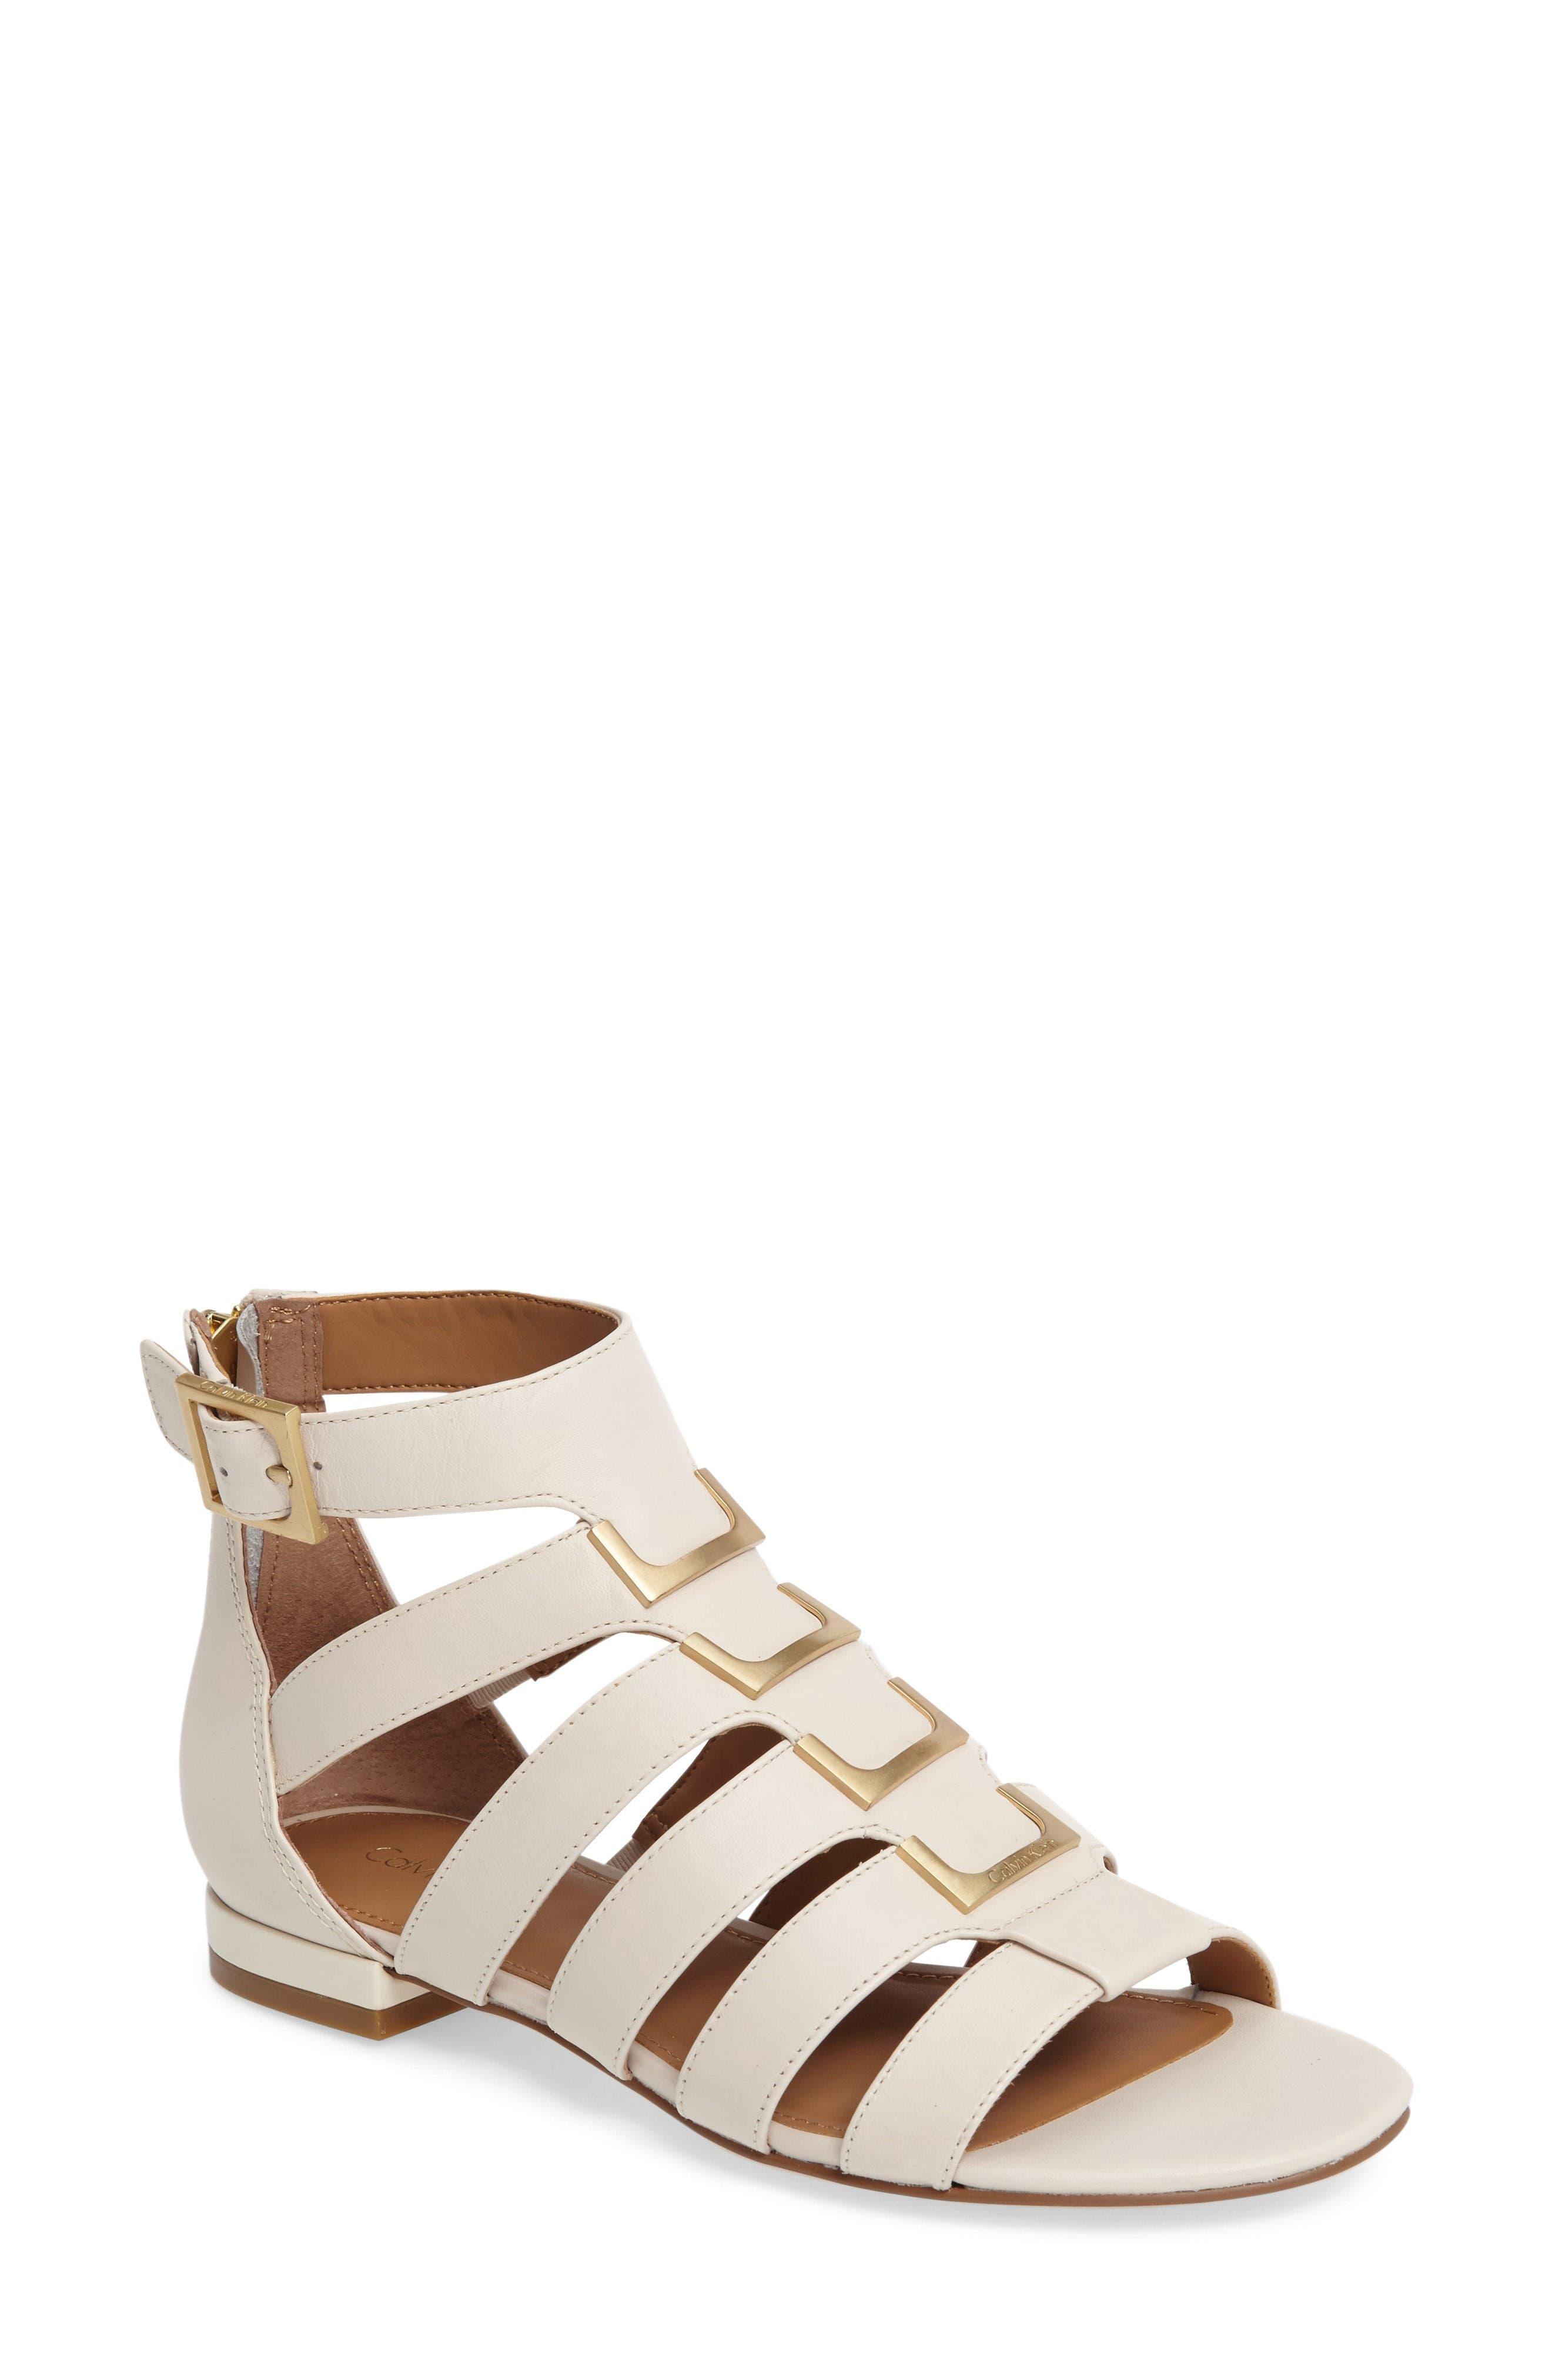 CALVIN KLEIN Estes Gladiator Sandal